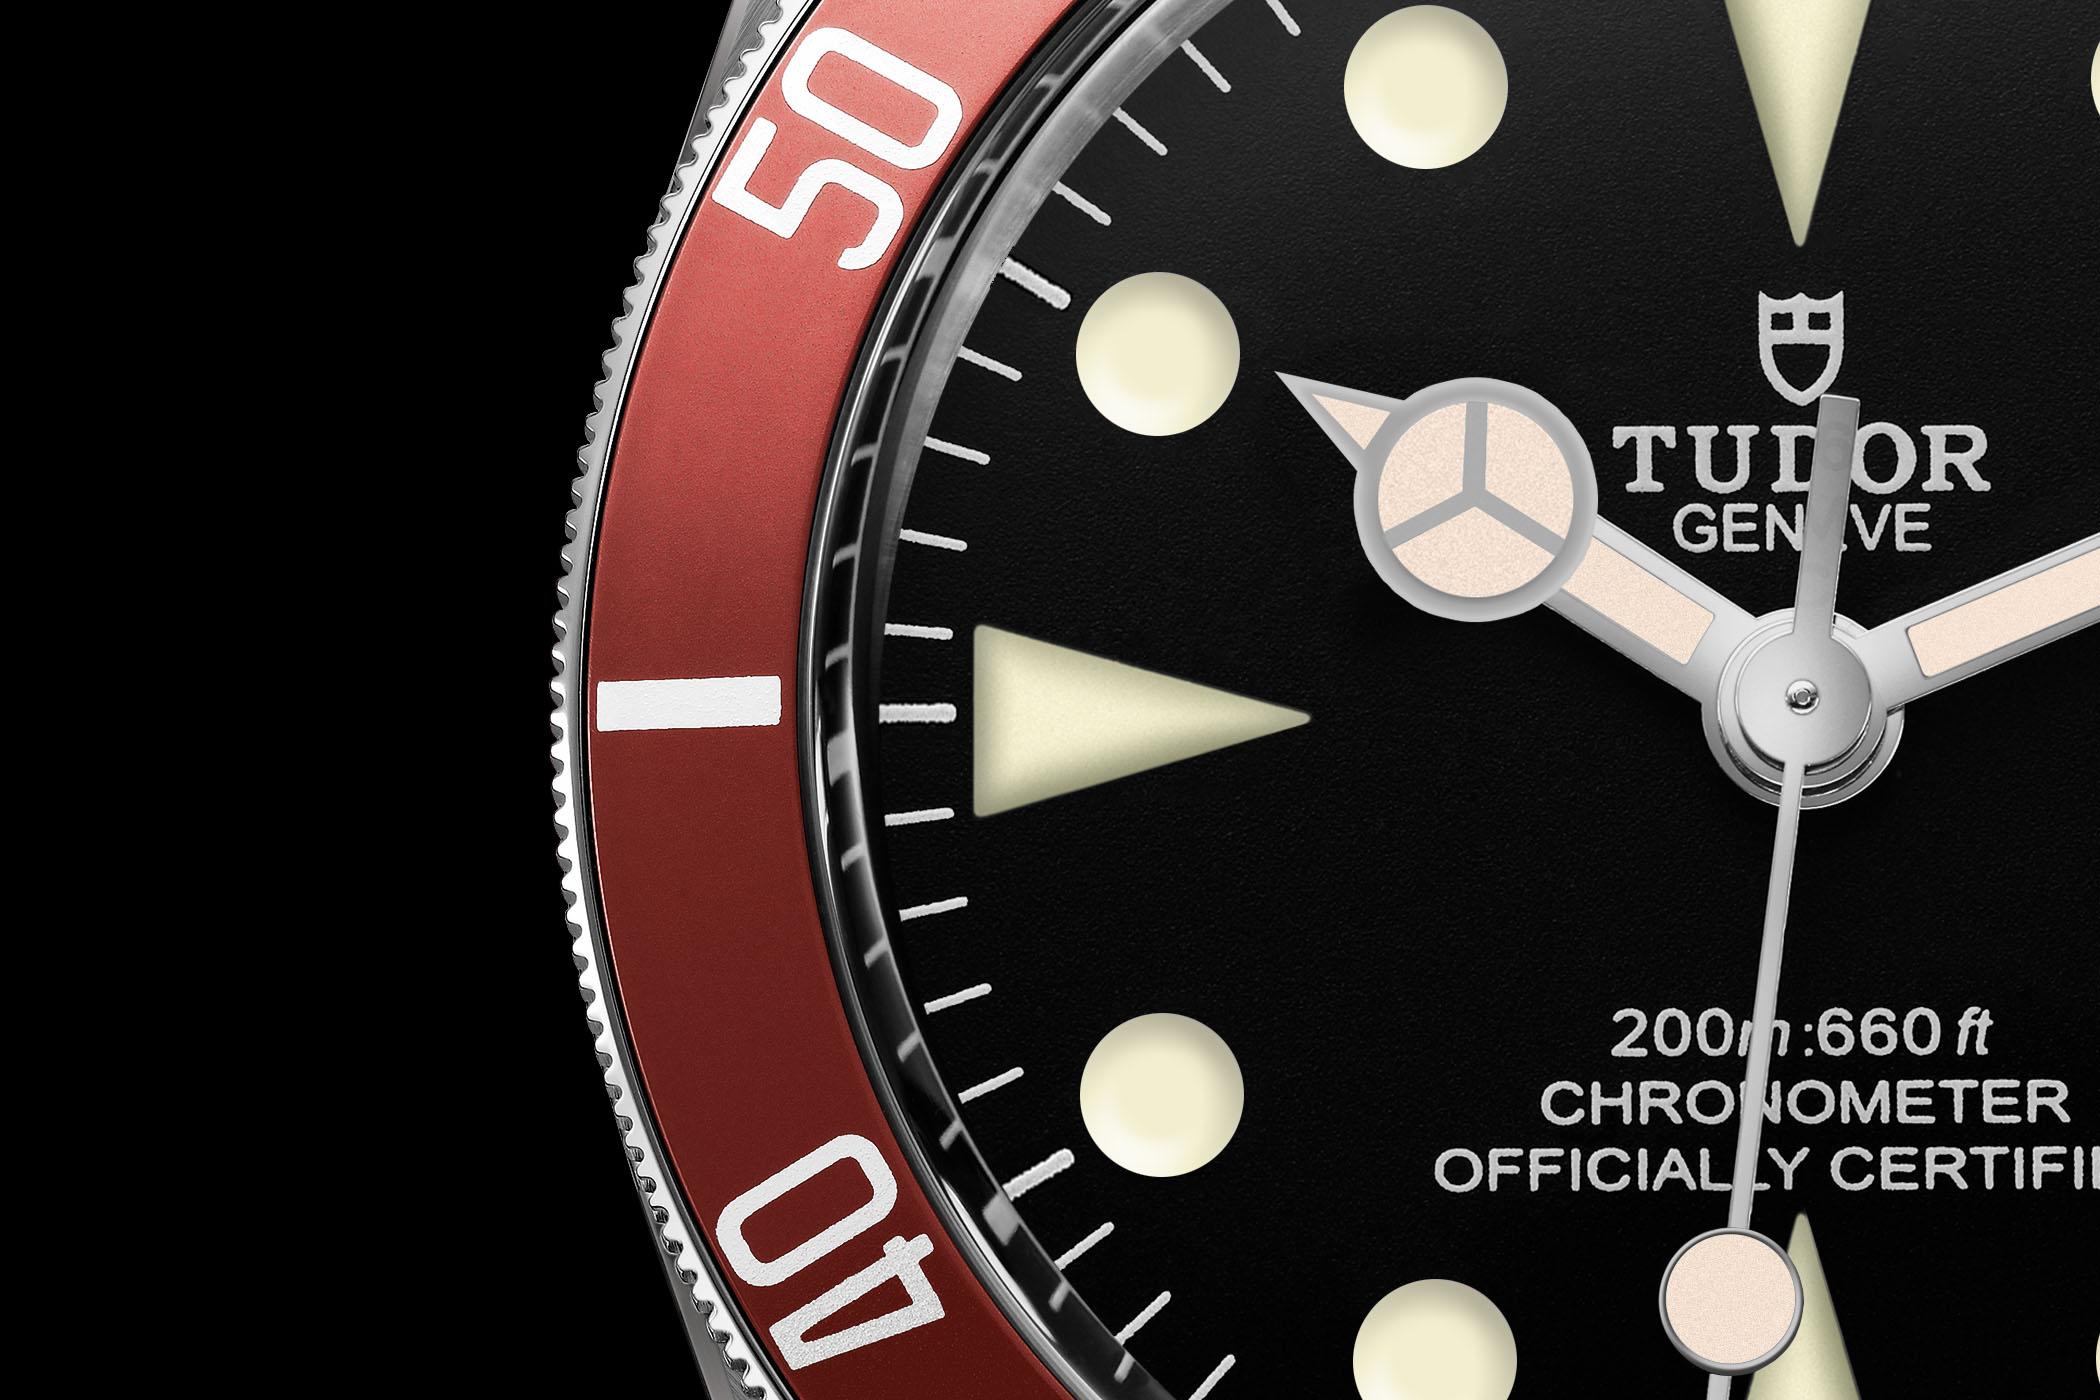 2019 Tudor OysterDate Submariner revival - Tudor Baselworld 2019 - Tudor 2019 Predictions - 13